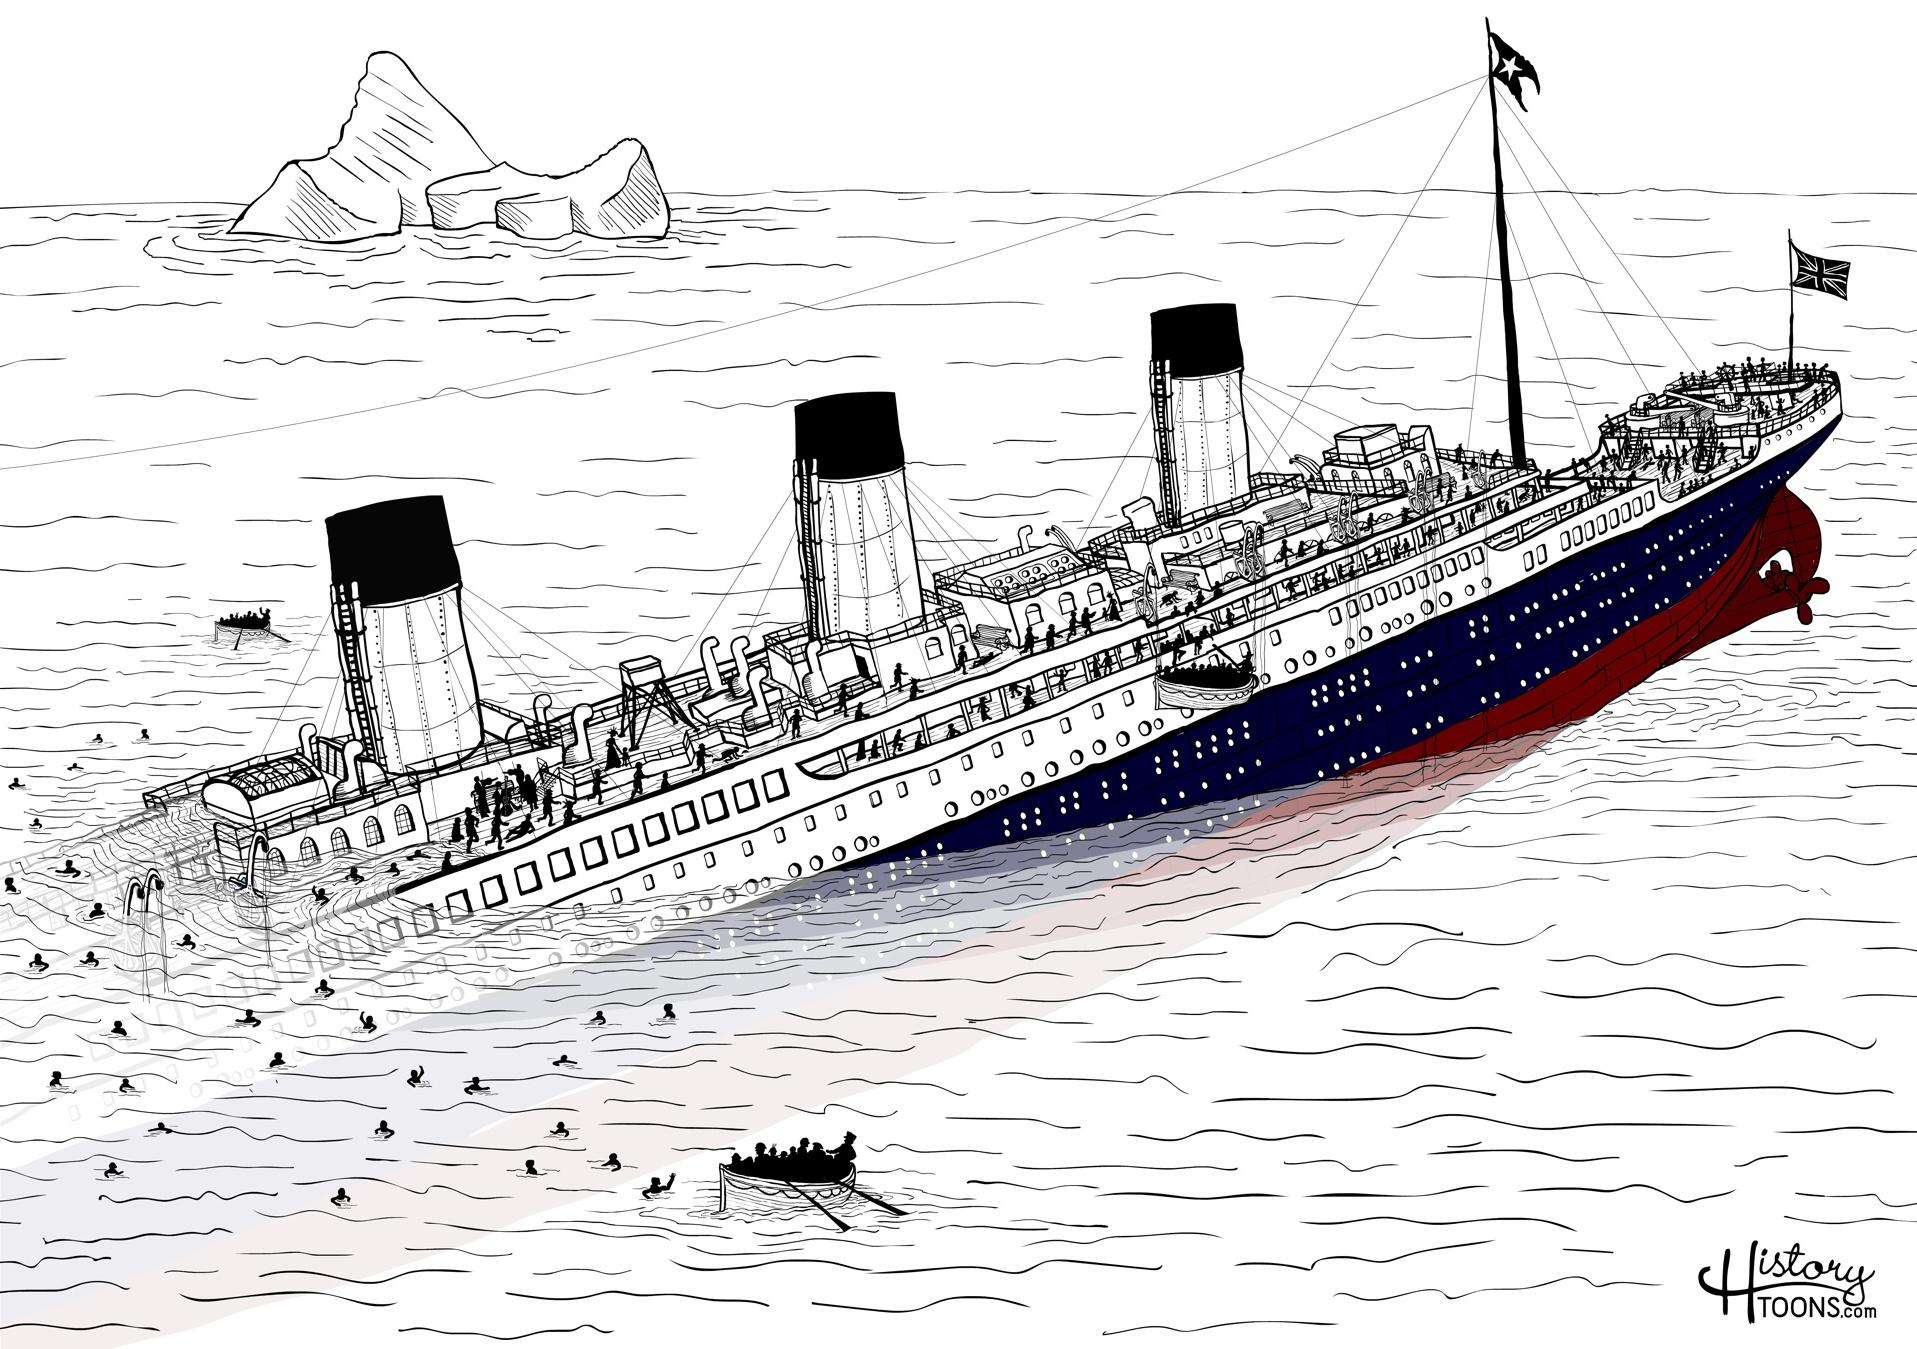 RMS_Titanic_1912_History_Toons_Kico_F_Uribe